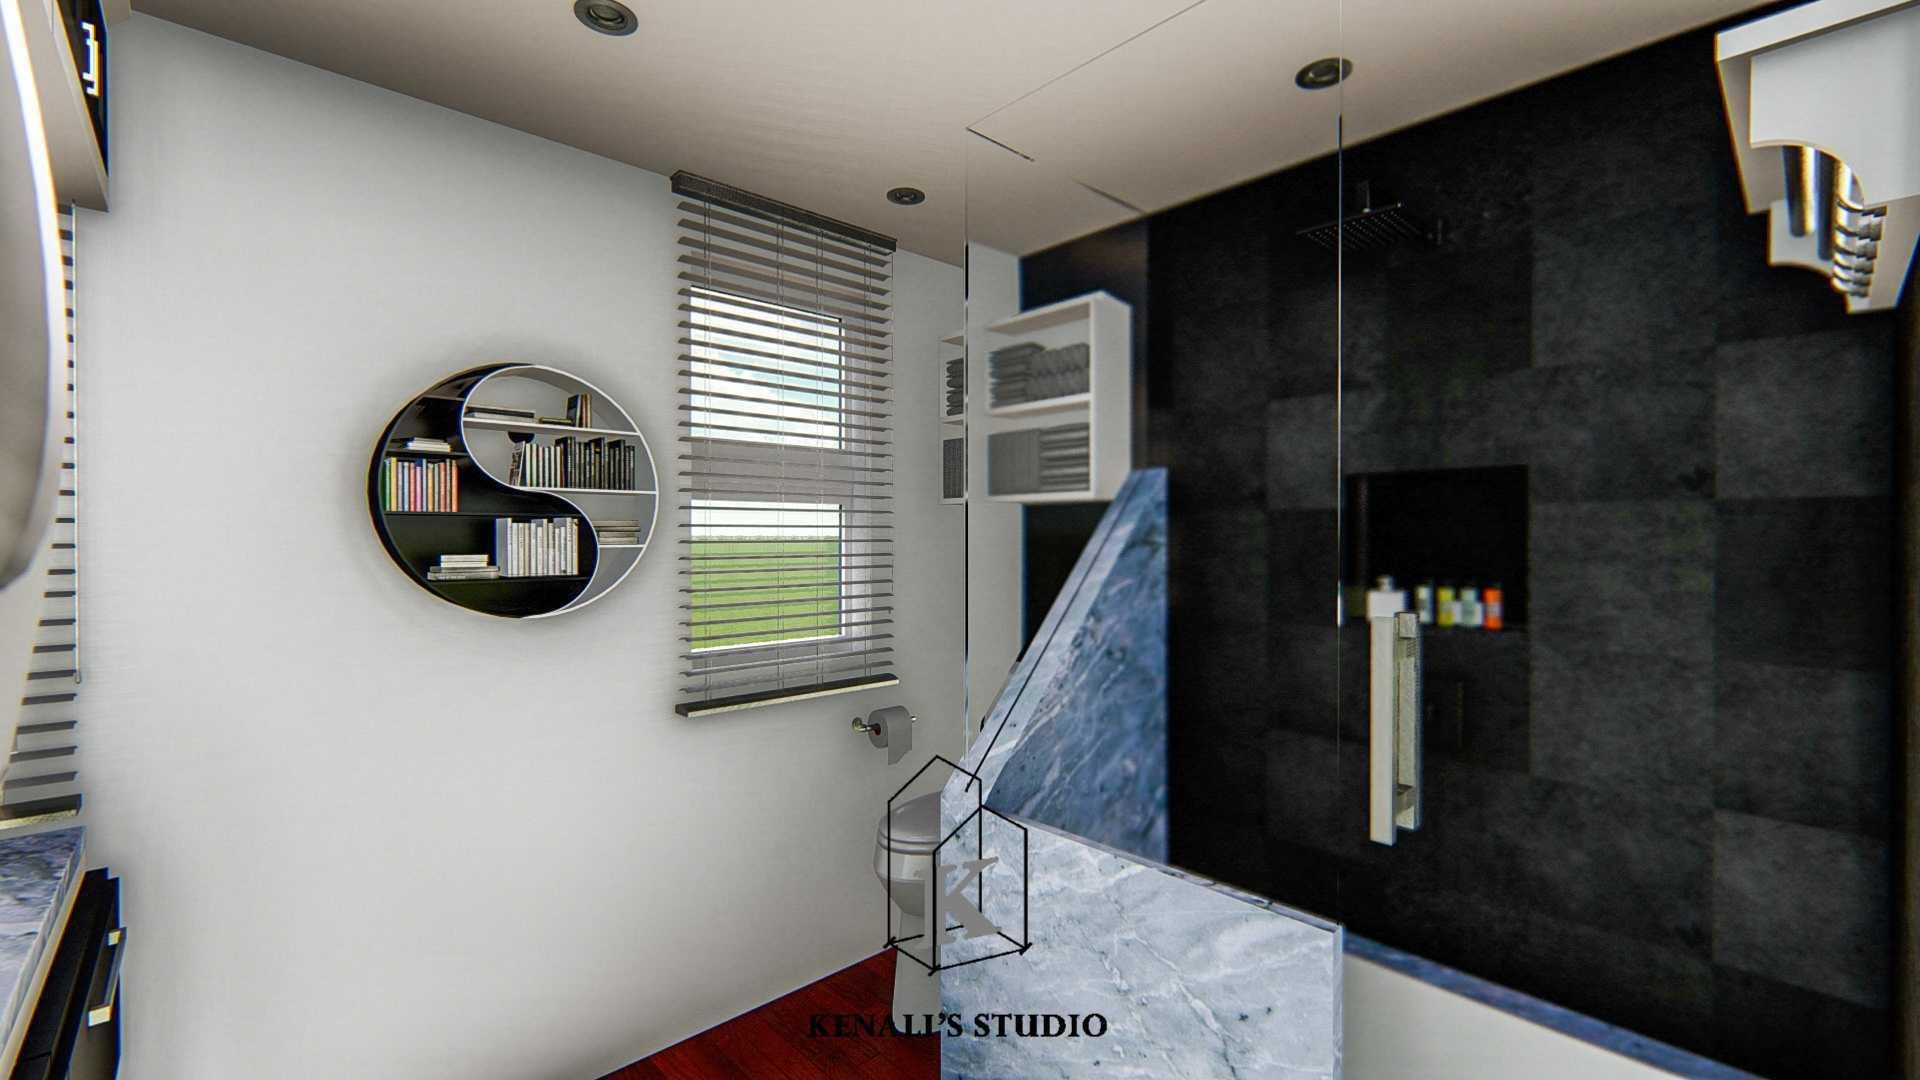 Kenali's Studio Project : Laundry & Bathroom Amerika Serikat Amerika Serikat Kenalis-Studio-Project-Laundry-Bathroom  72922